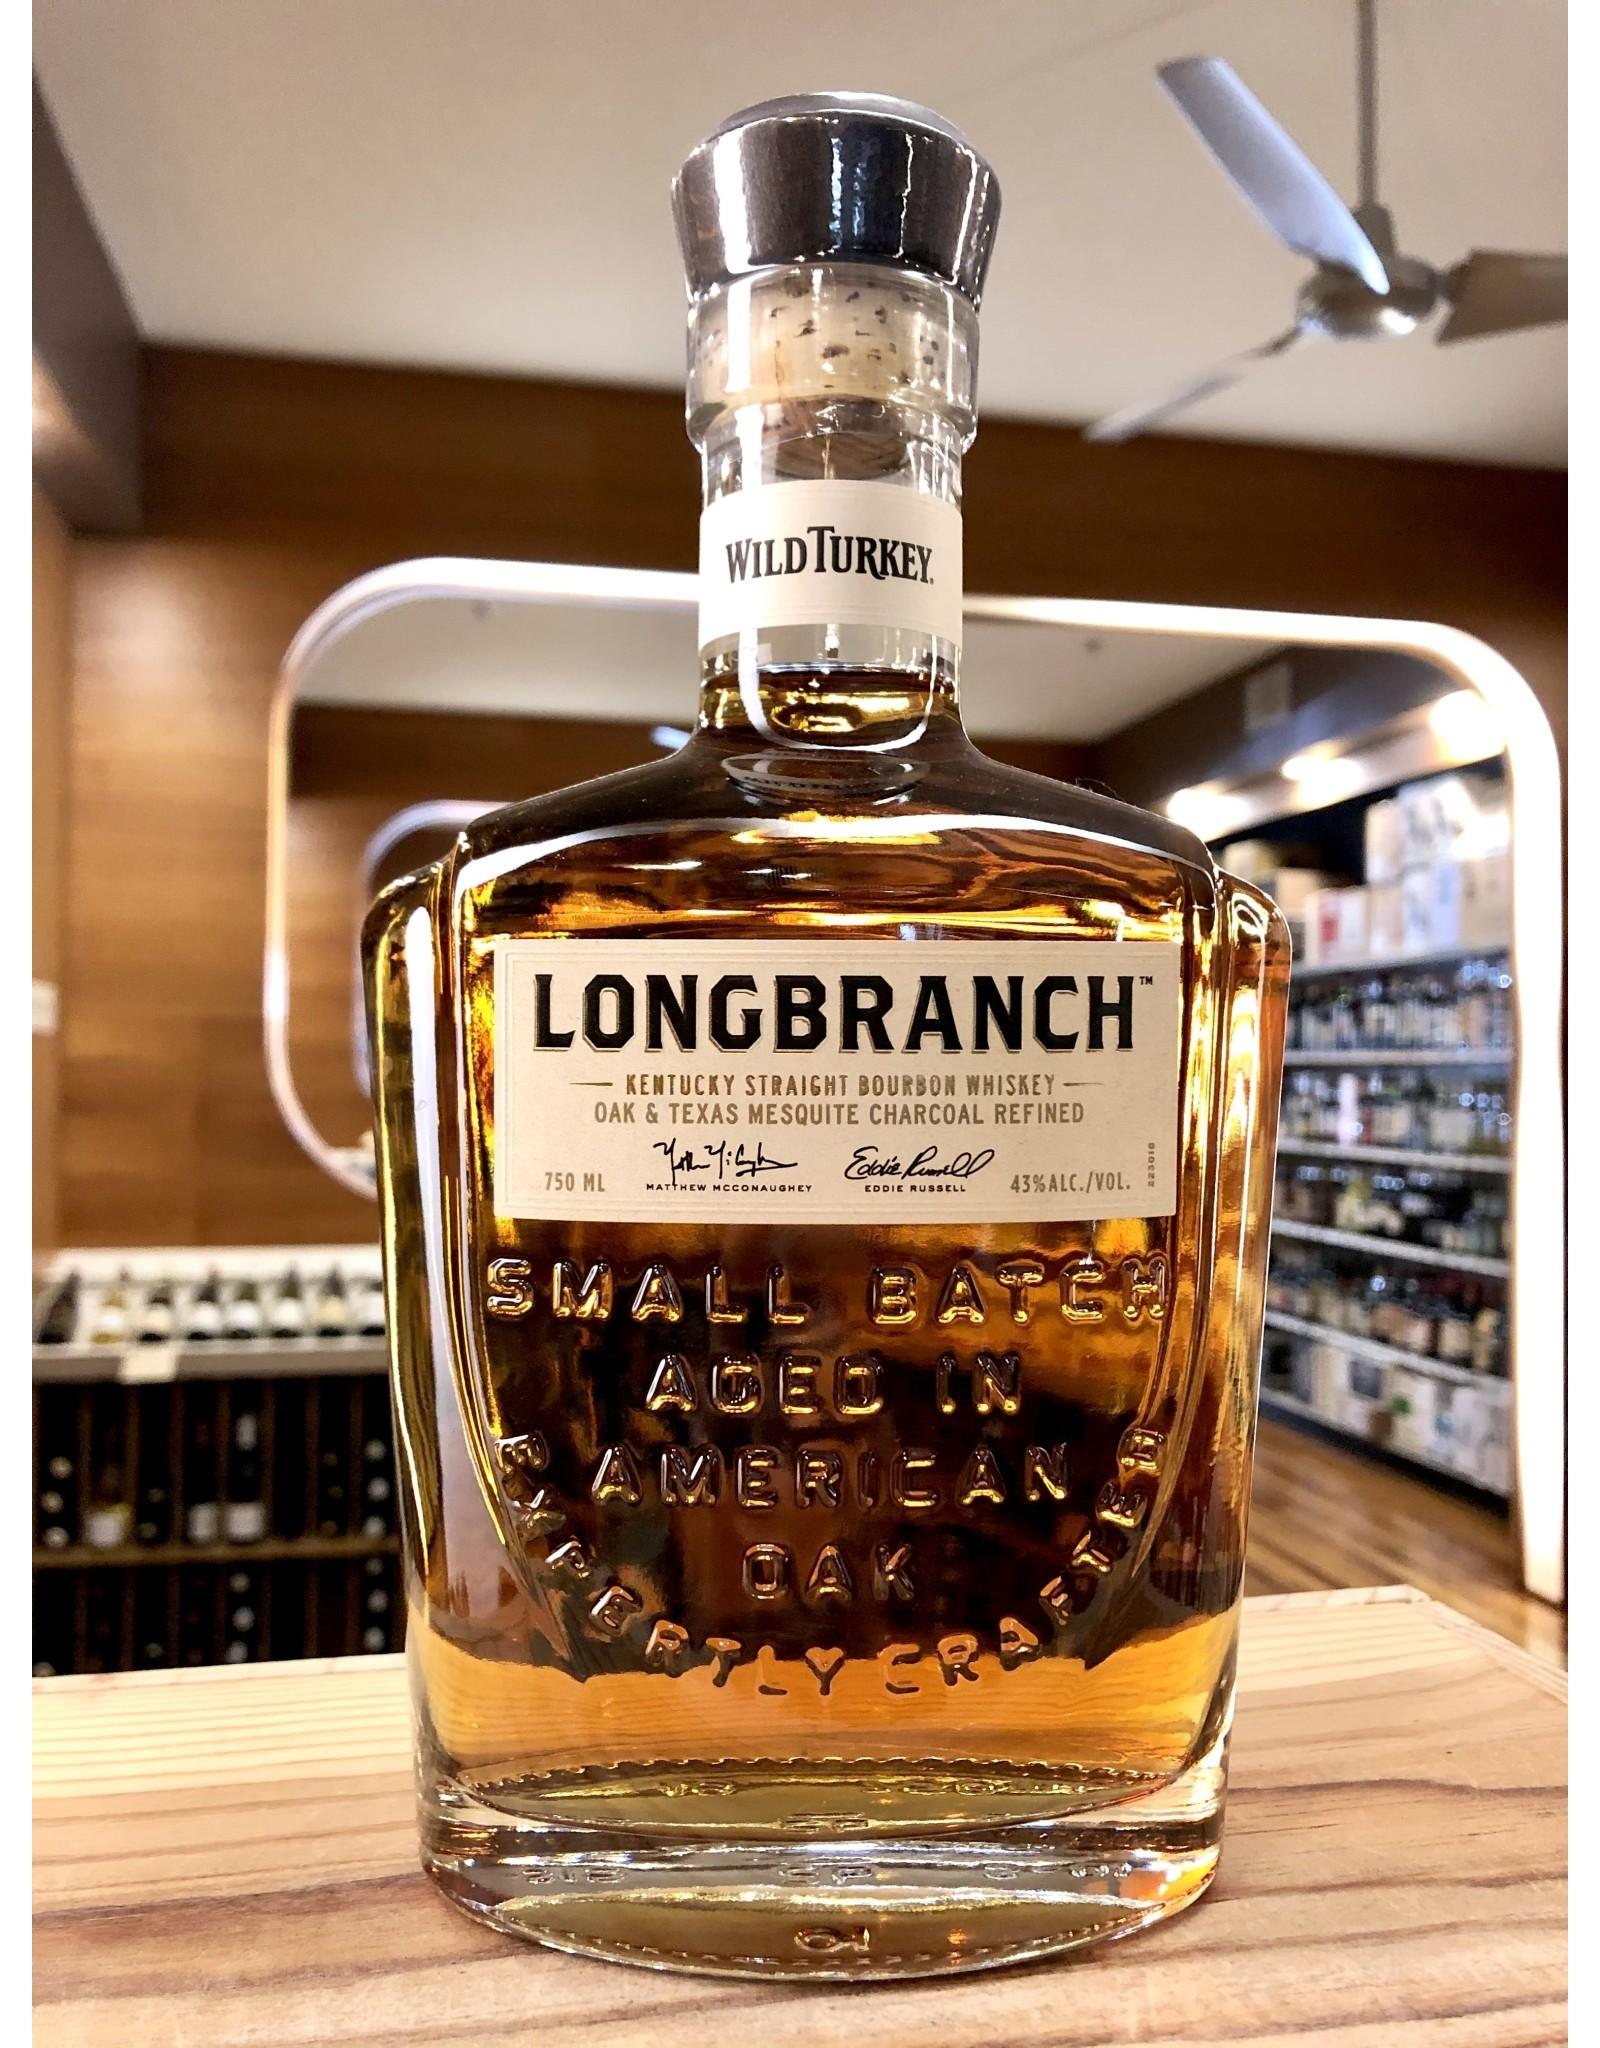 Wild Turkey Longbranch Bourbon - 750 ML